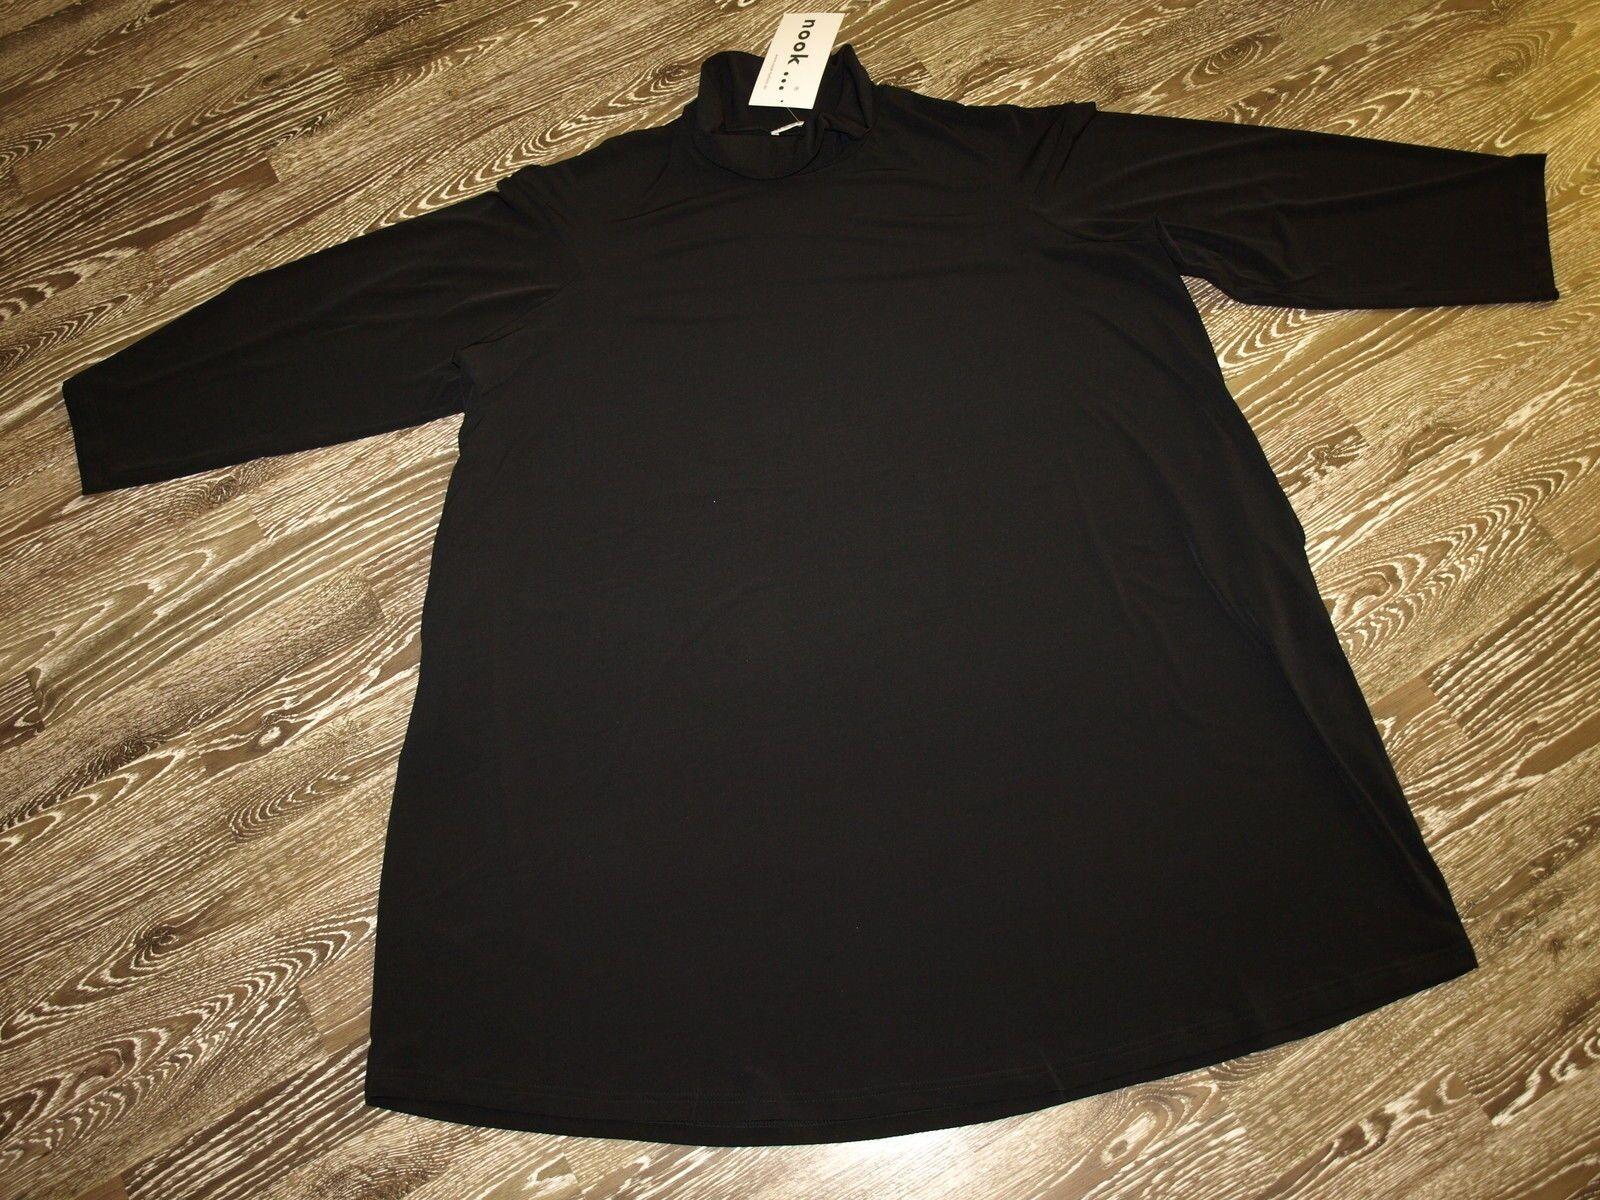 NOOK Lagenlook Kleid -Tunika in schwarz Gr3(50-52) Neu